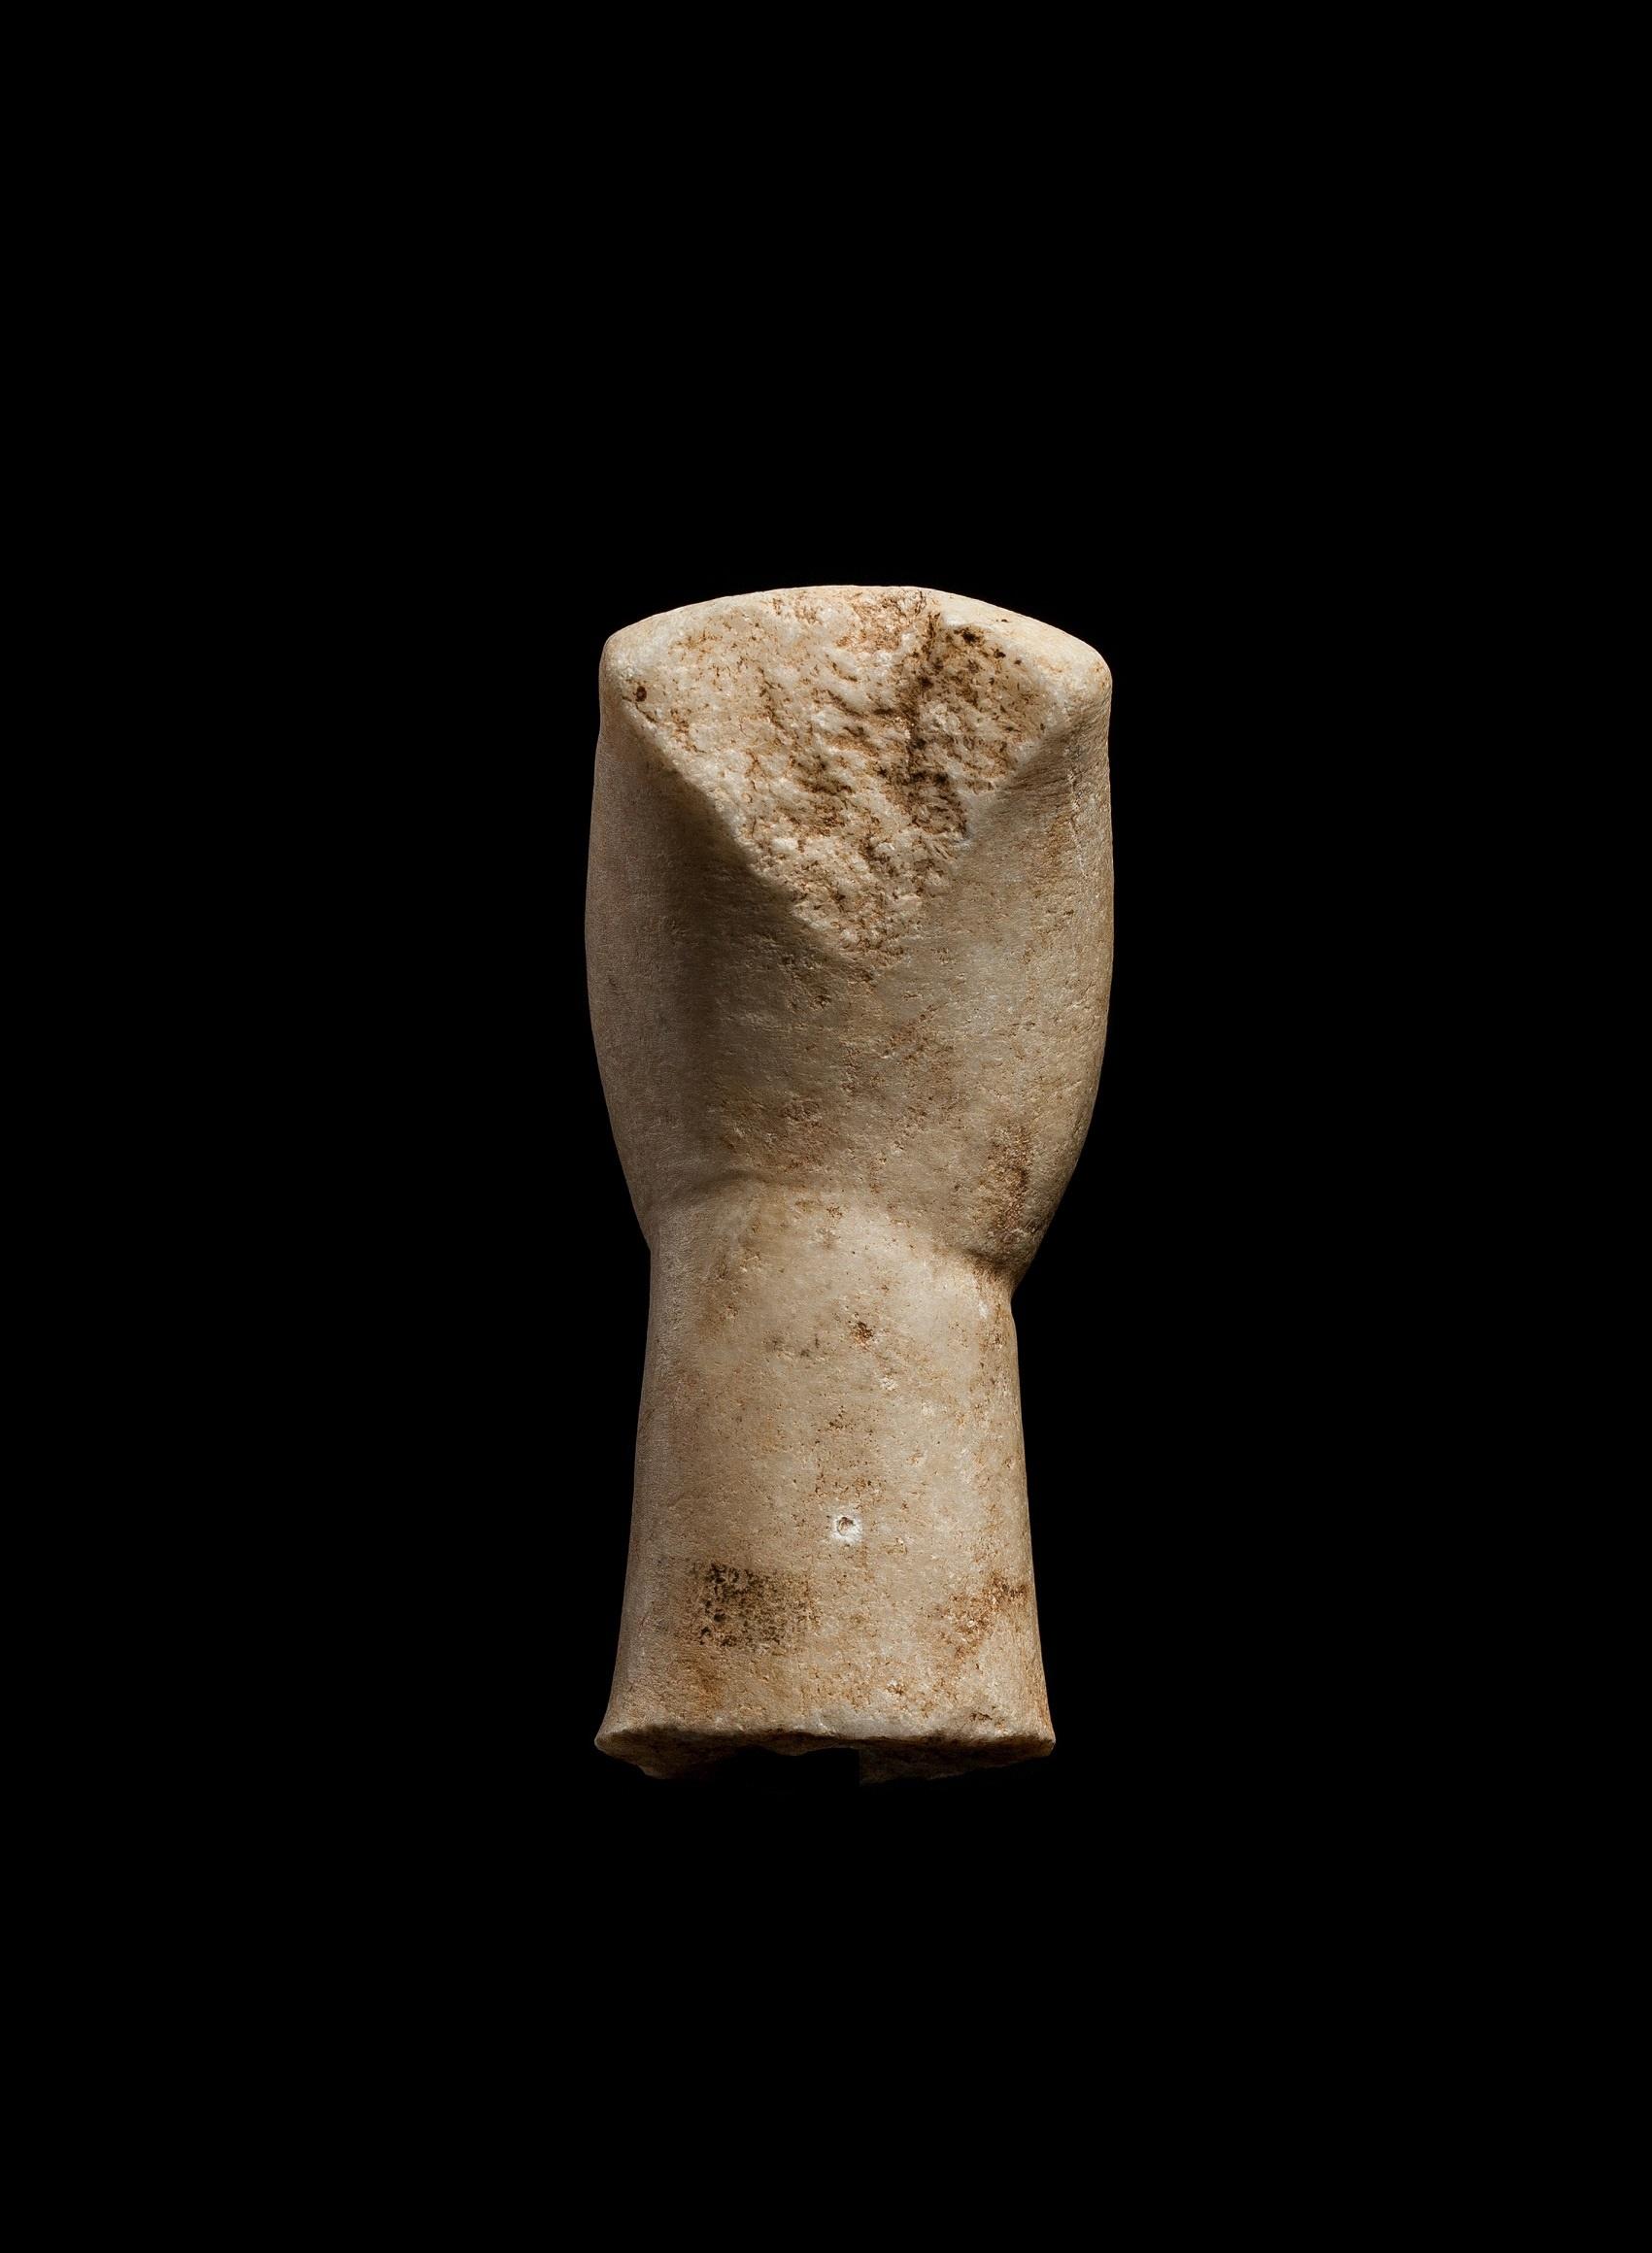 CYCLADIC IDOL HEAD CYCLADES, EARLY CYCLADIC II, C. 2600 - 2400 B.C. - Image 4 of 6